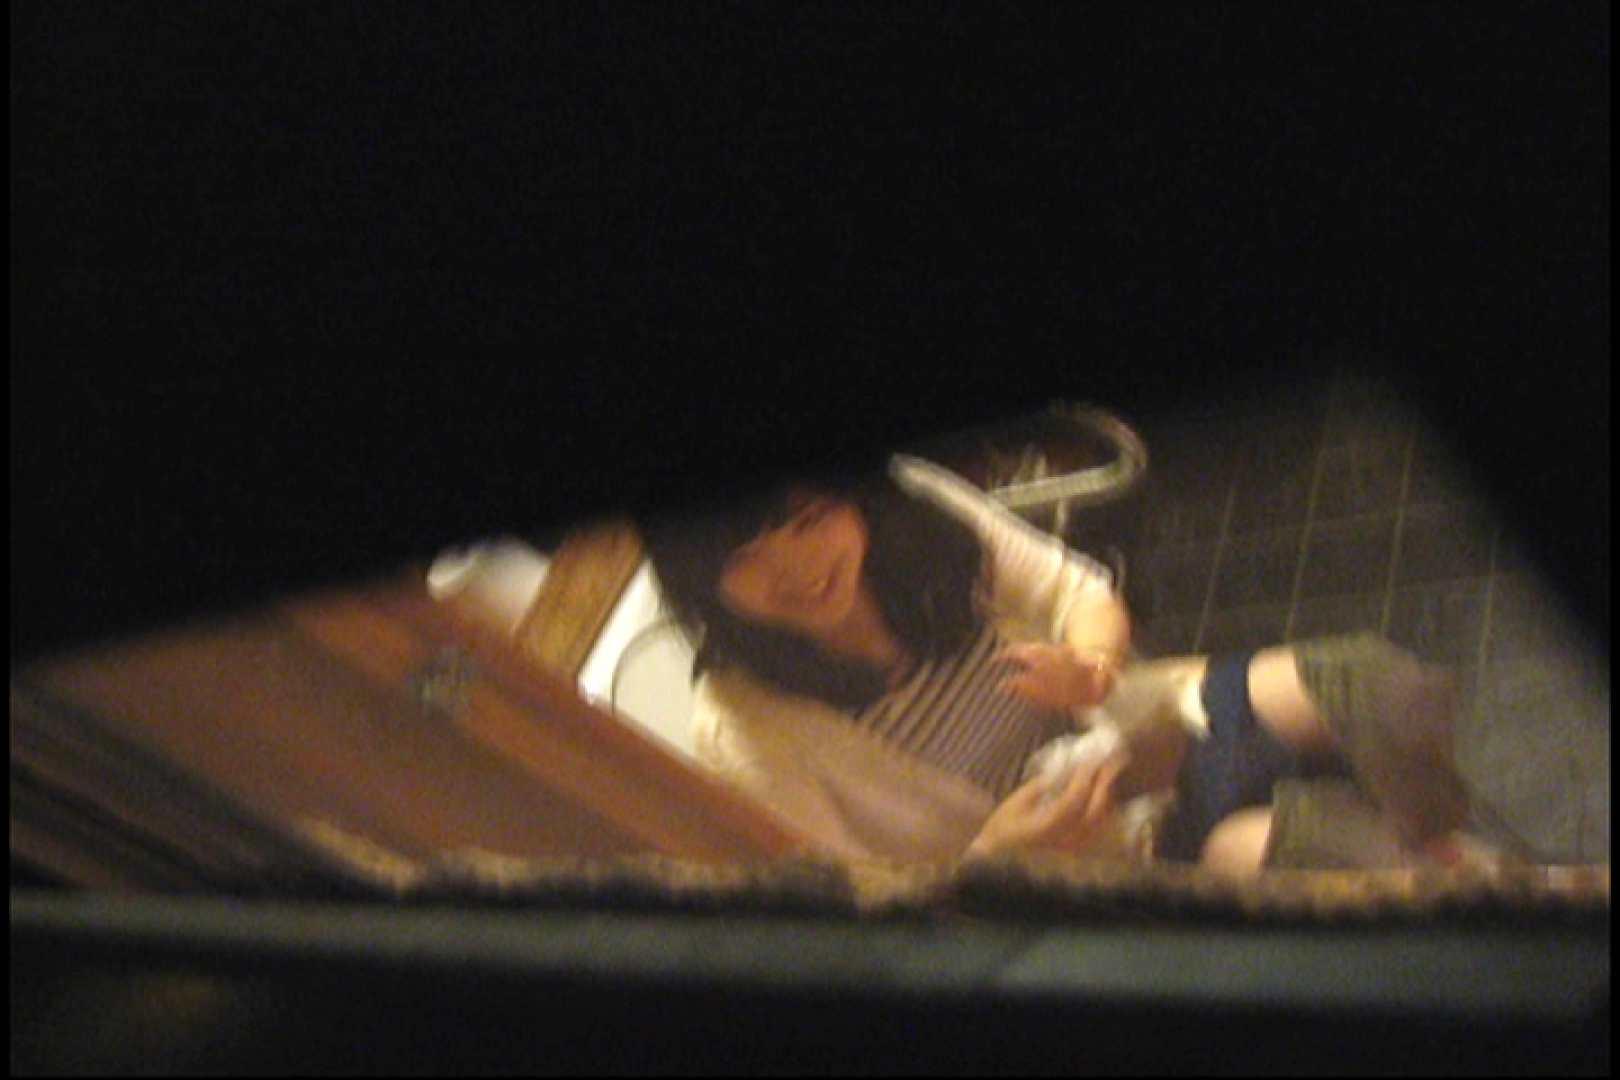 No.4 美人の洋式kawaya内での様子を観察! 盗撮 SEX無修正画像 90pic 78